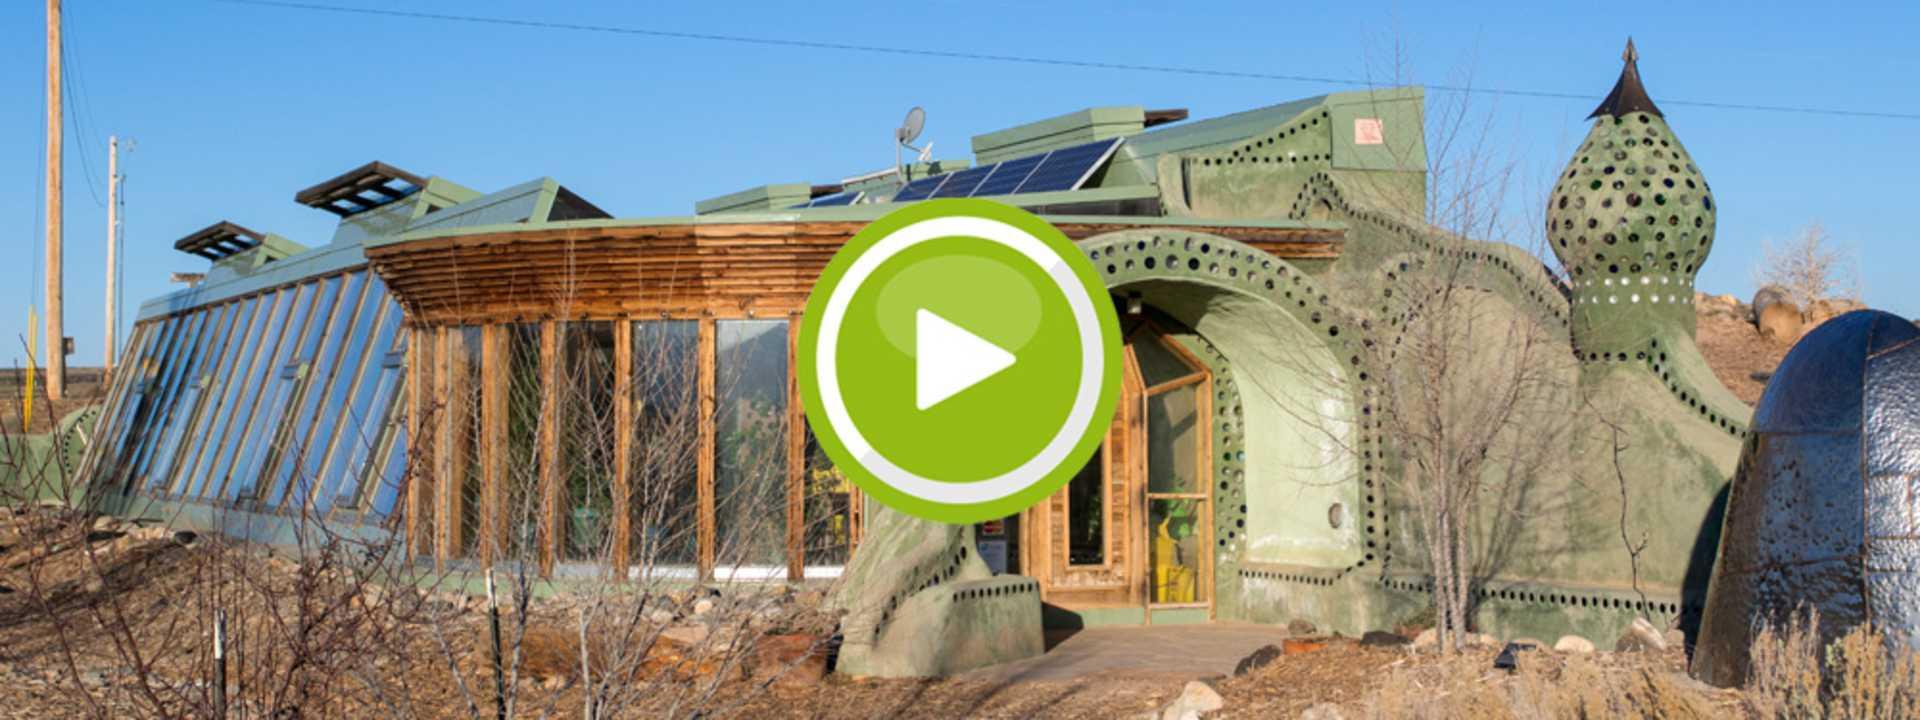 Earthships in Taos